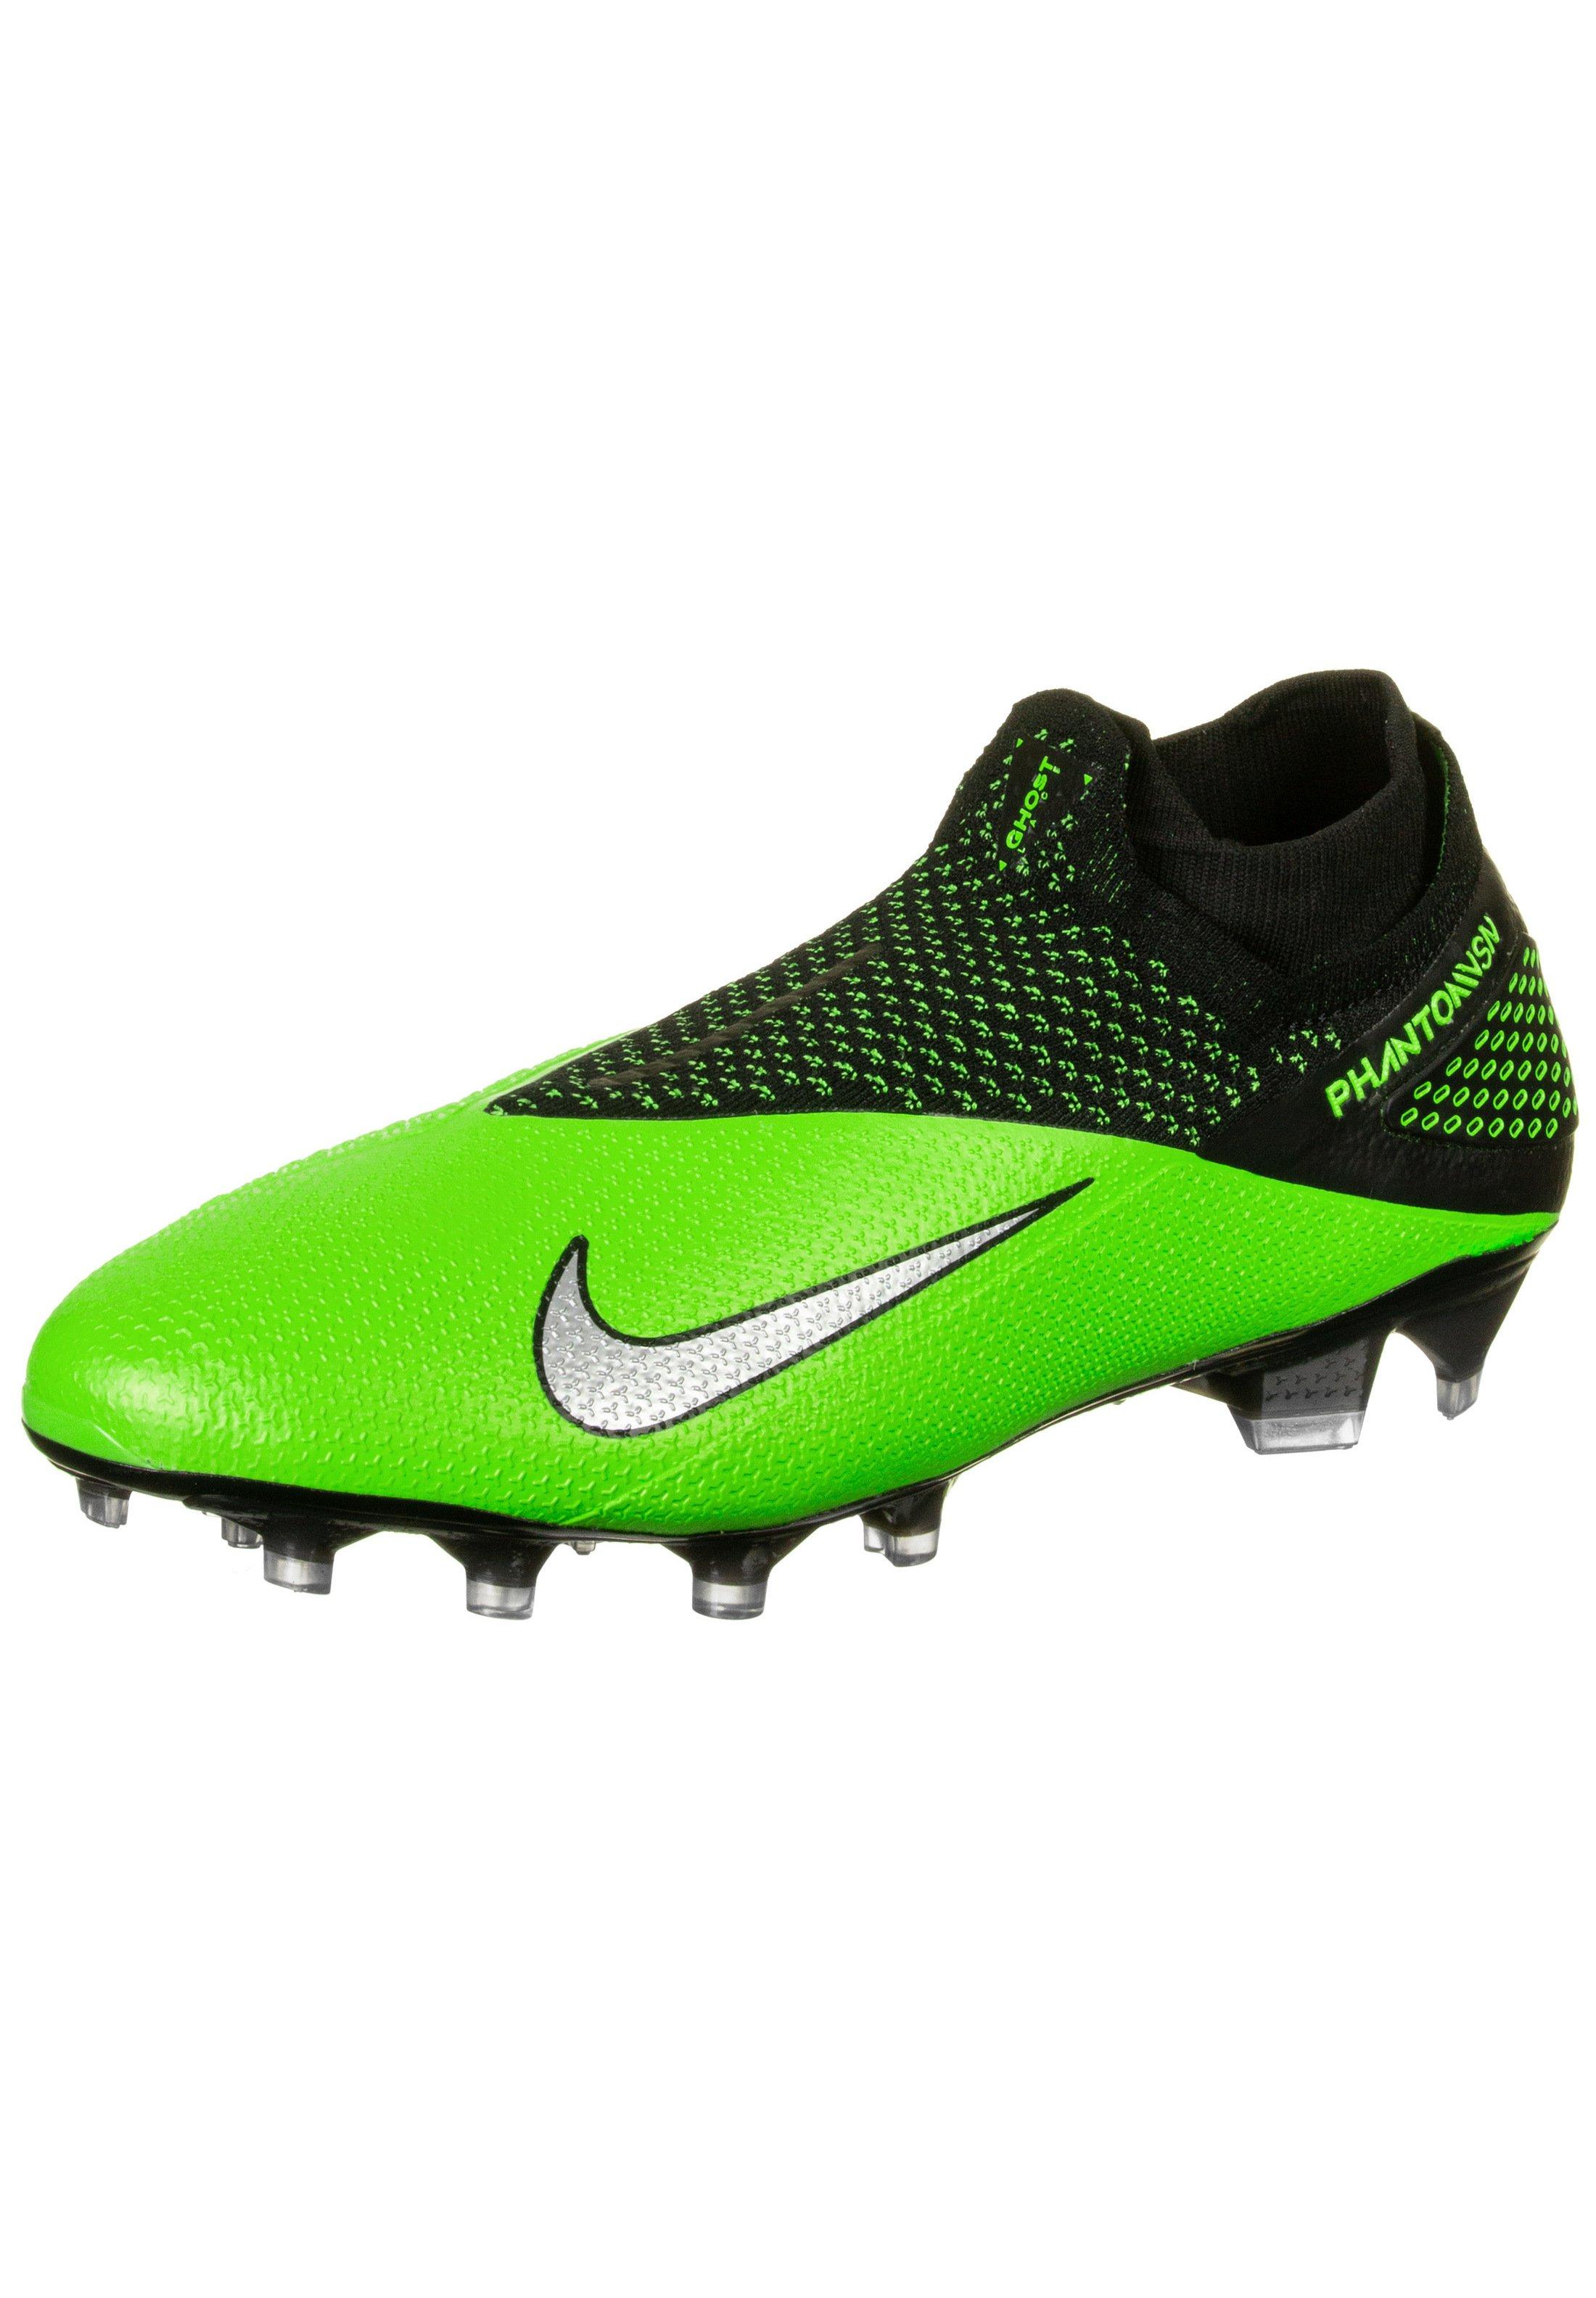 PHANTOM VISION Chaussures de foot à crampons black metallic platinum green strike